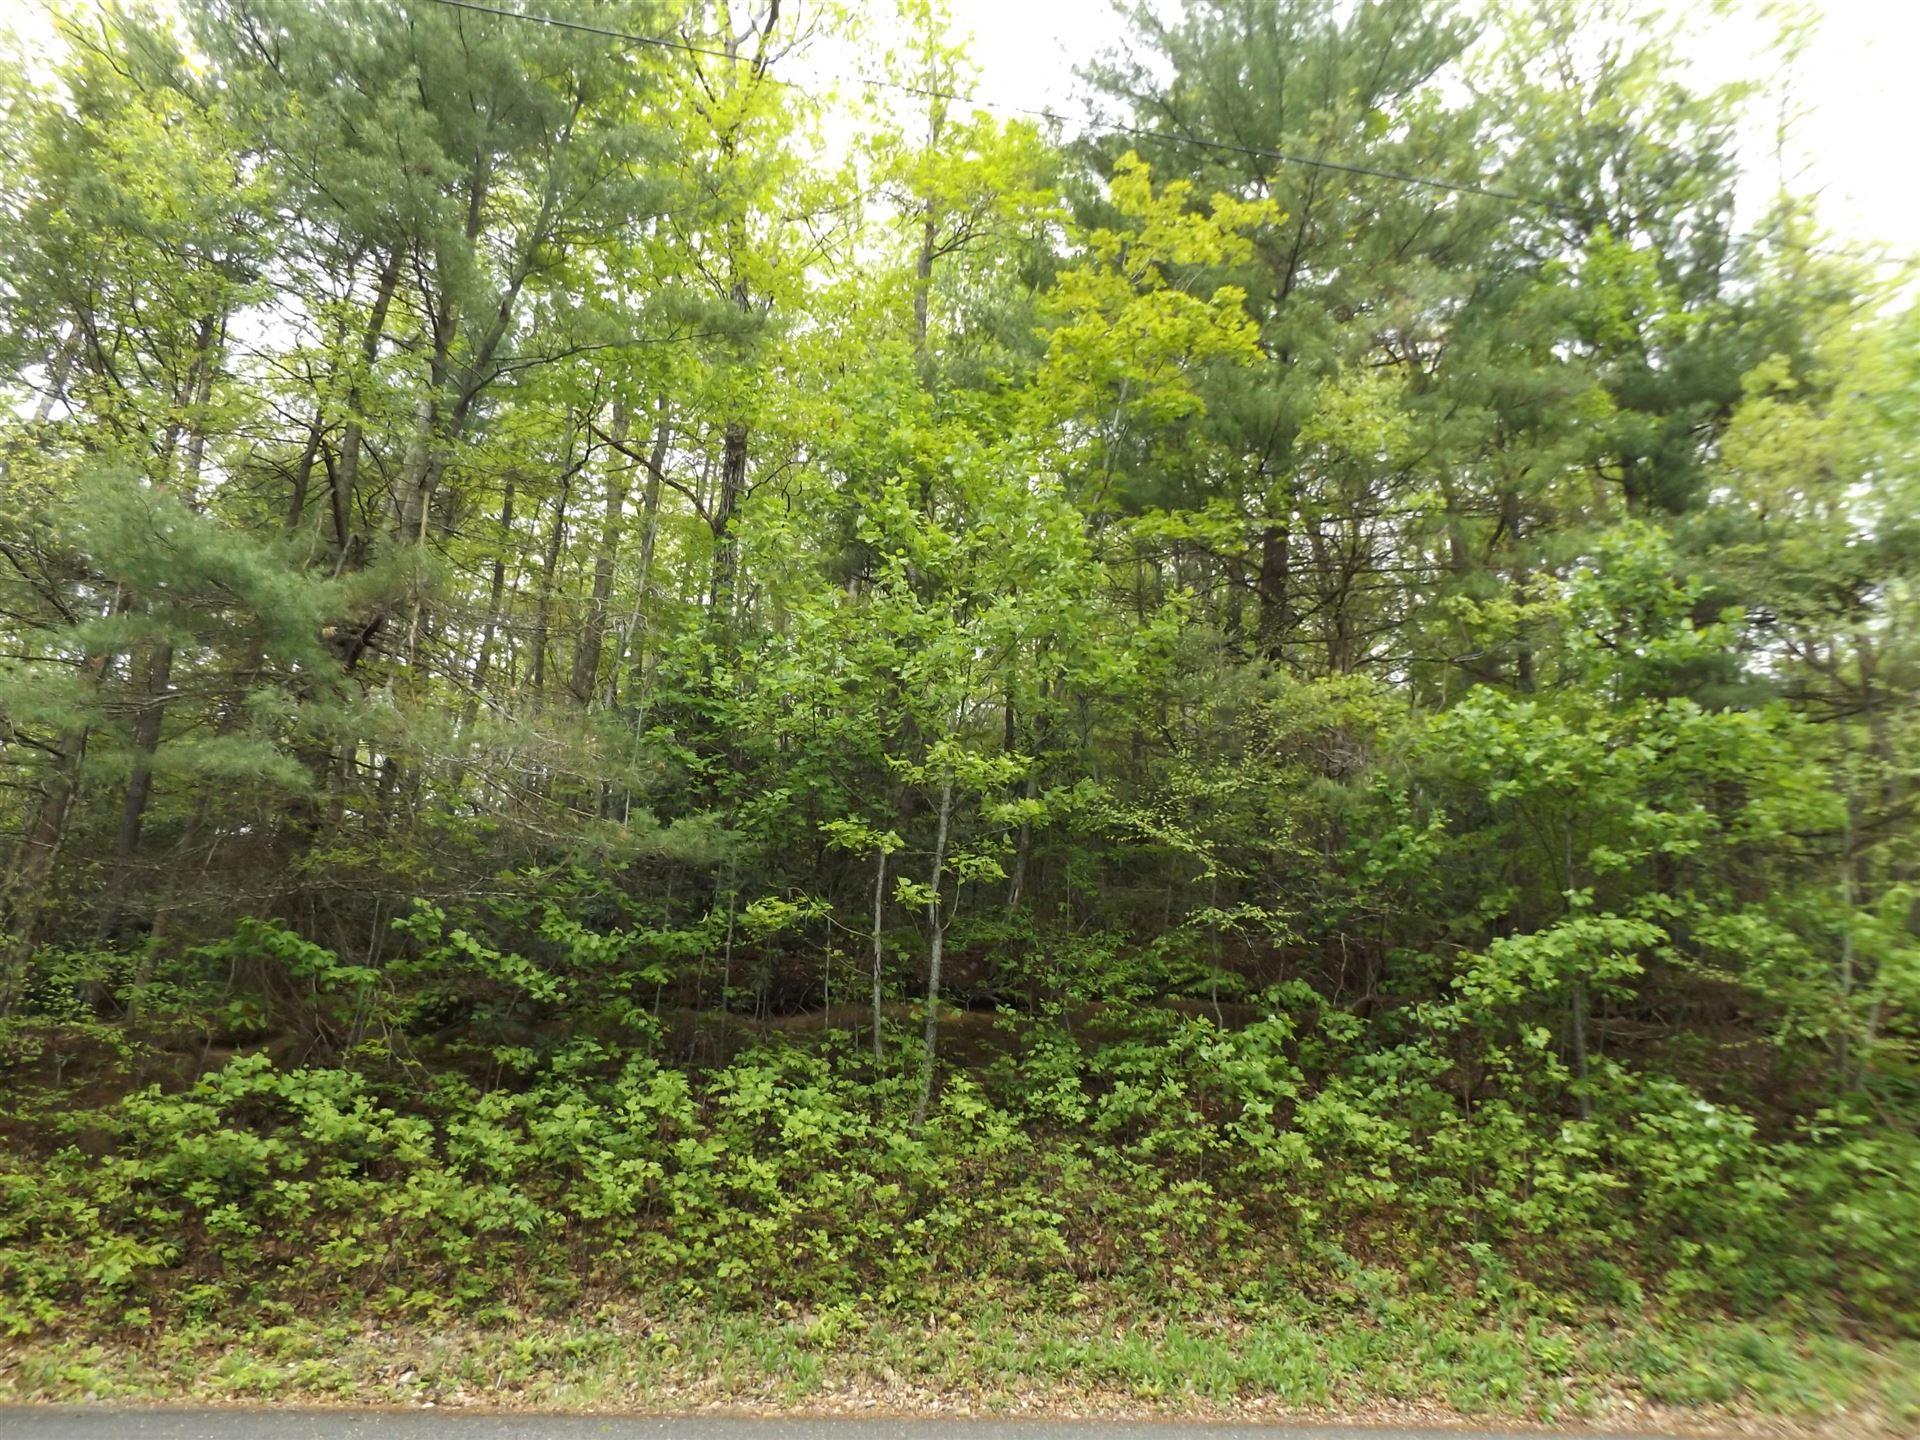 Photo of Lot 38/39 Timber Lane, Hampton, TN 37658 (MLS # 9922239)